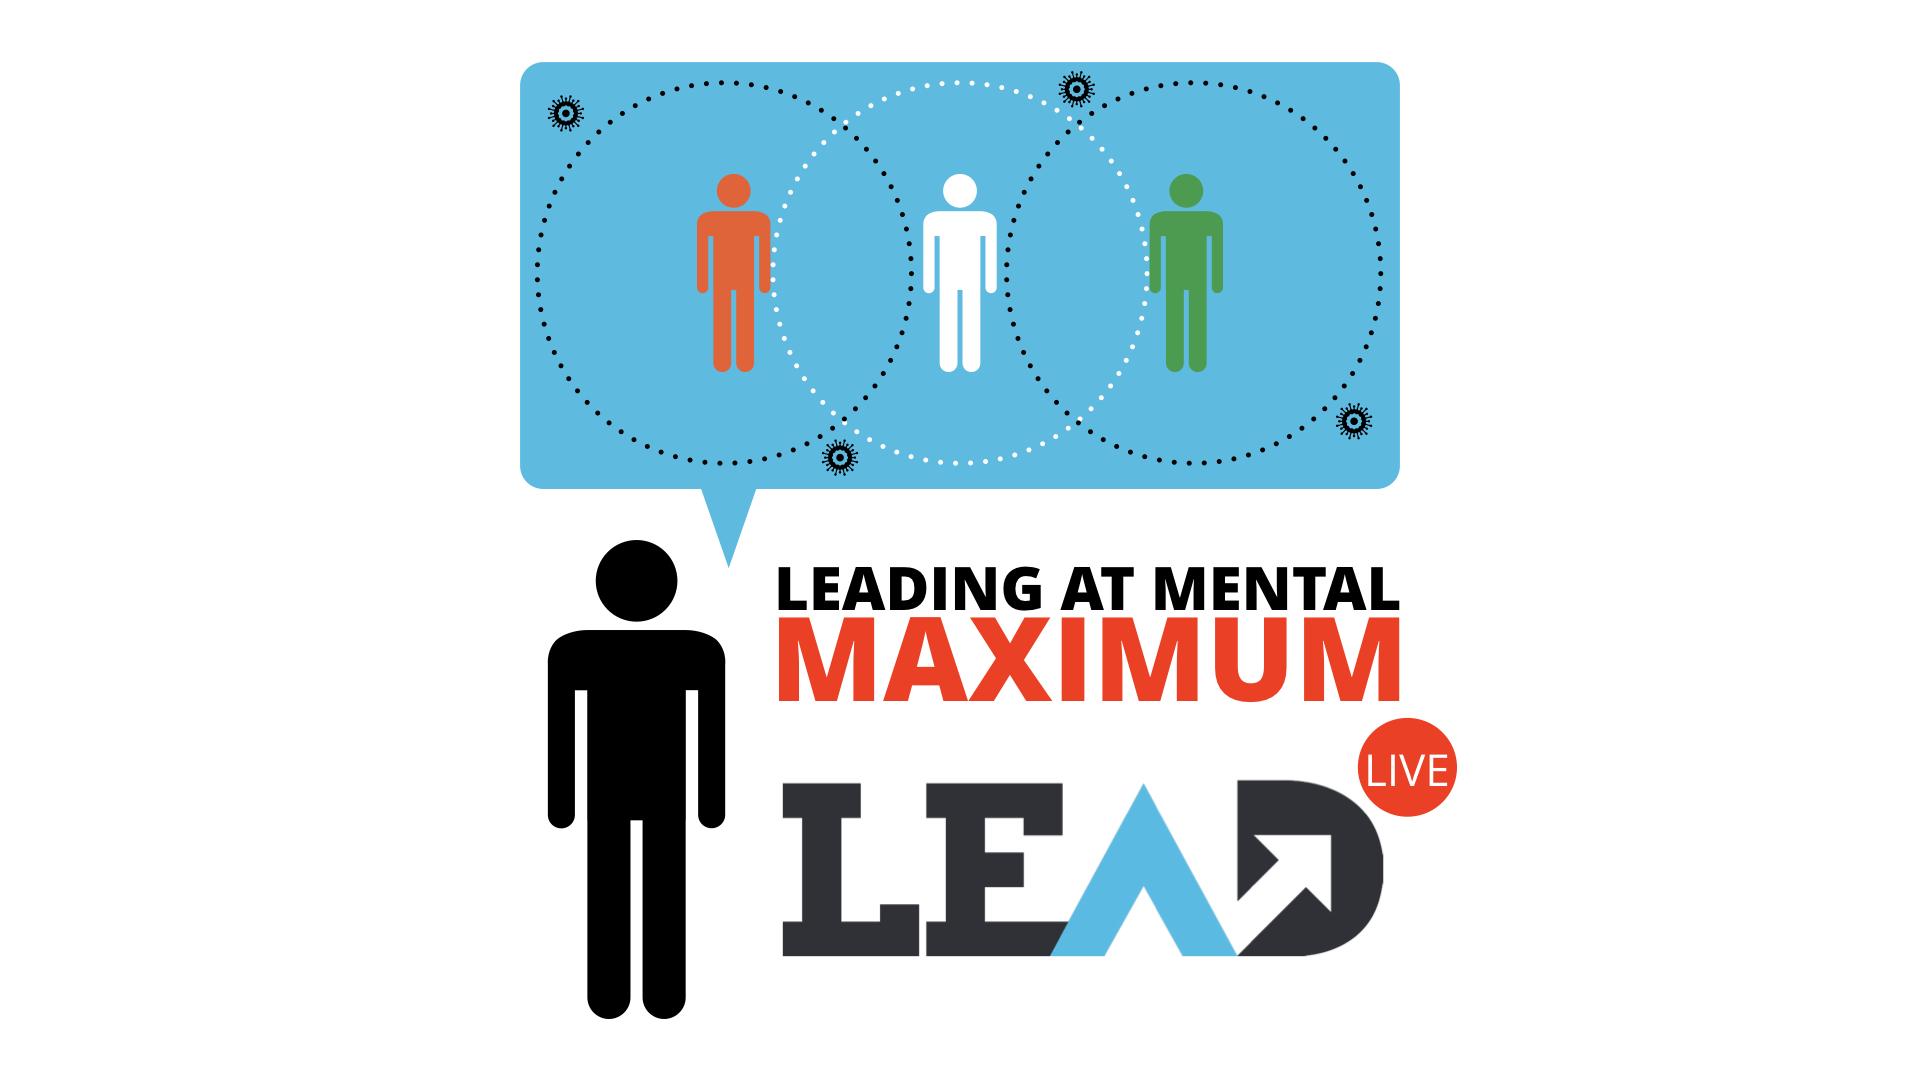 Leading at Mental Maximum